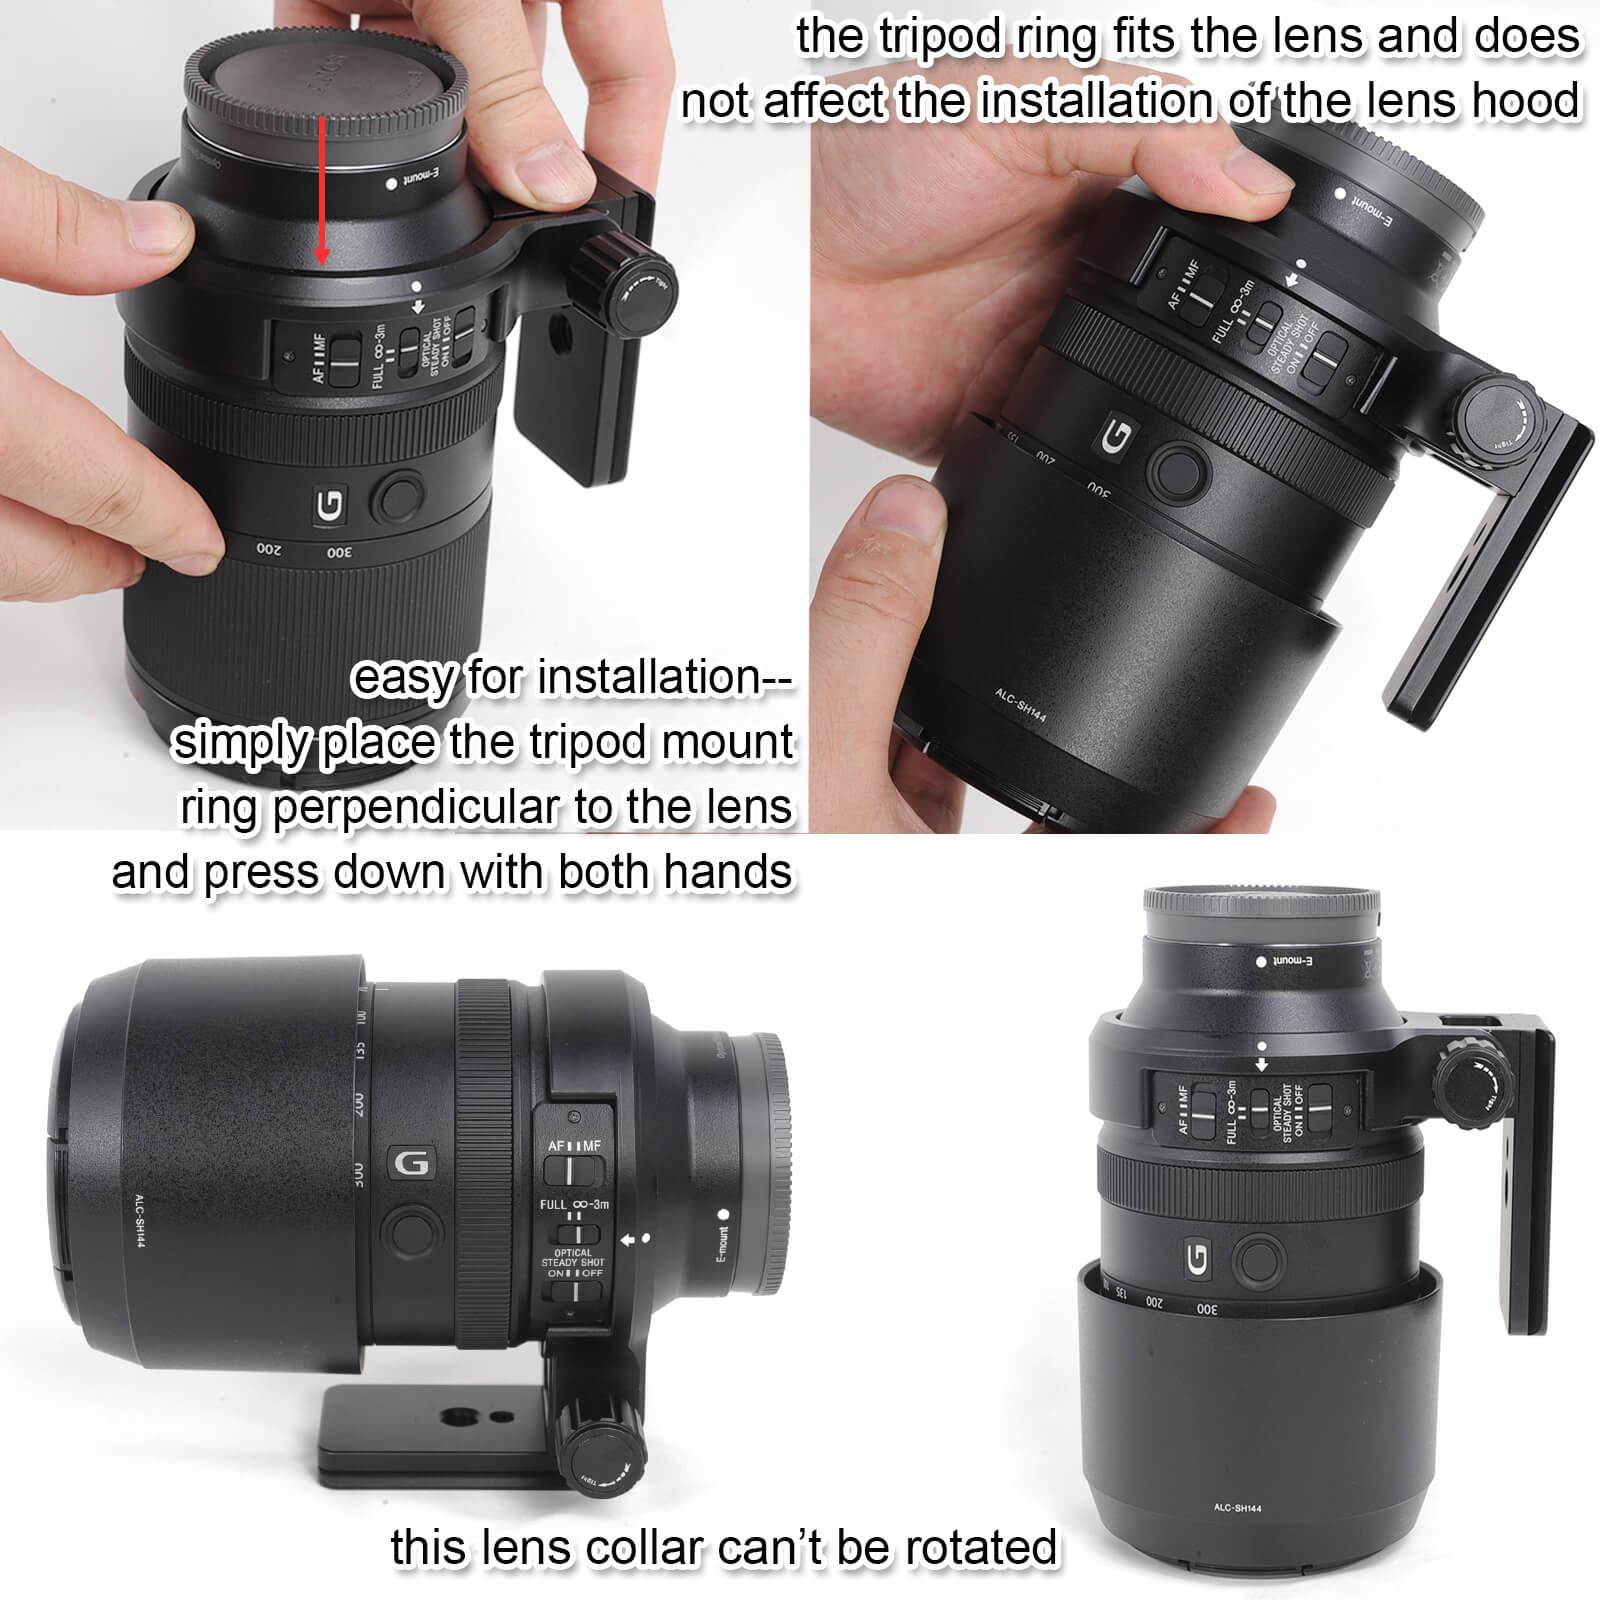 Объектив воротник штатив крепление кольцо для sony FE 70-300 мм f/4,5-5,6G OSS объектив SEL70300G, встроенный Arca-Swiss Quick Release Plate